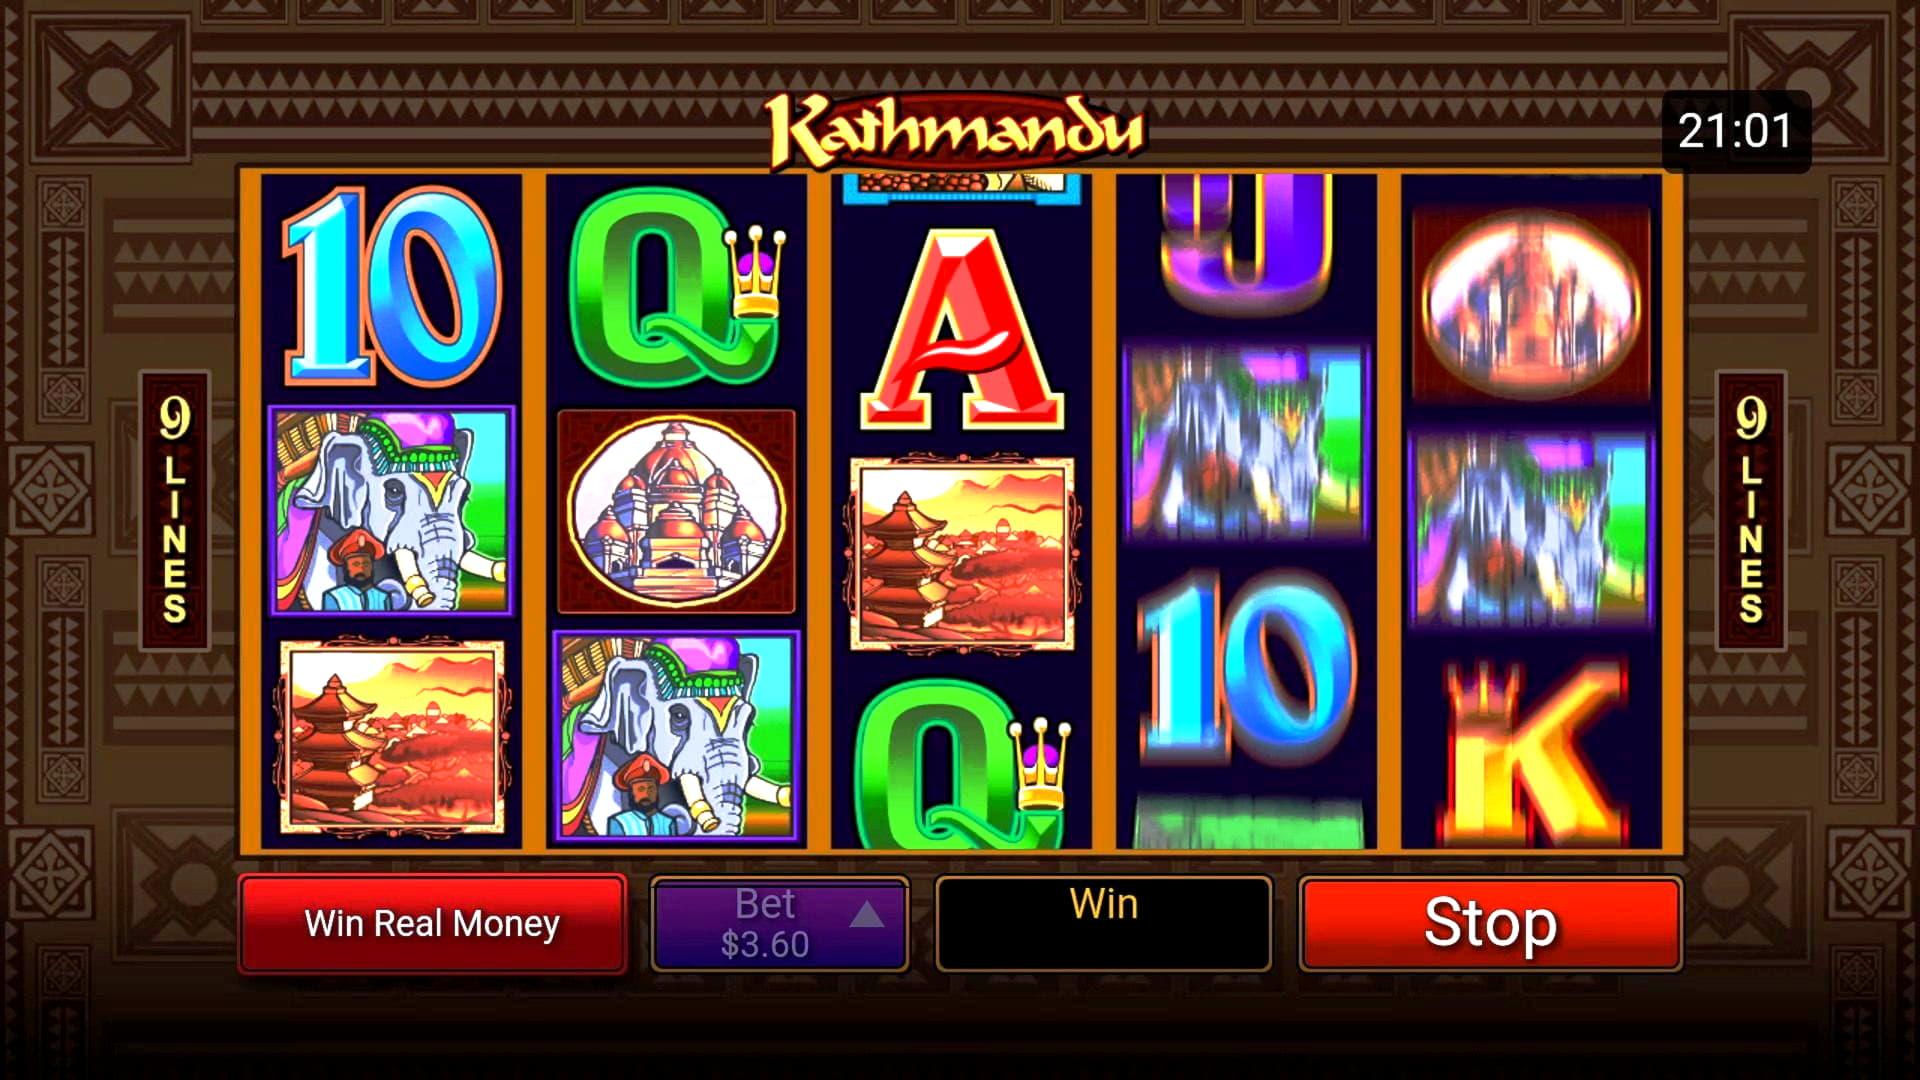 Casino Online Free Deposit